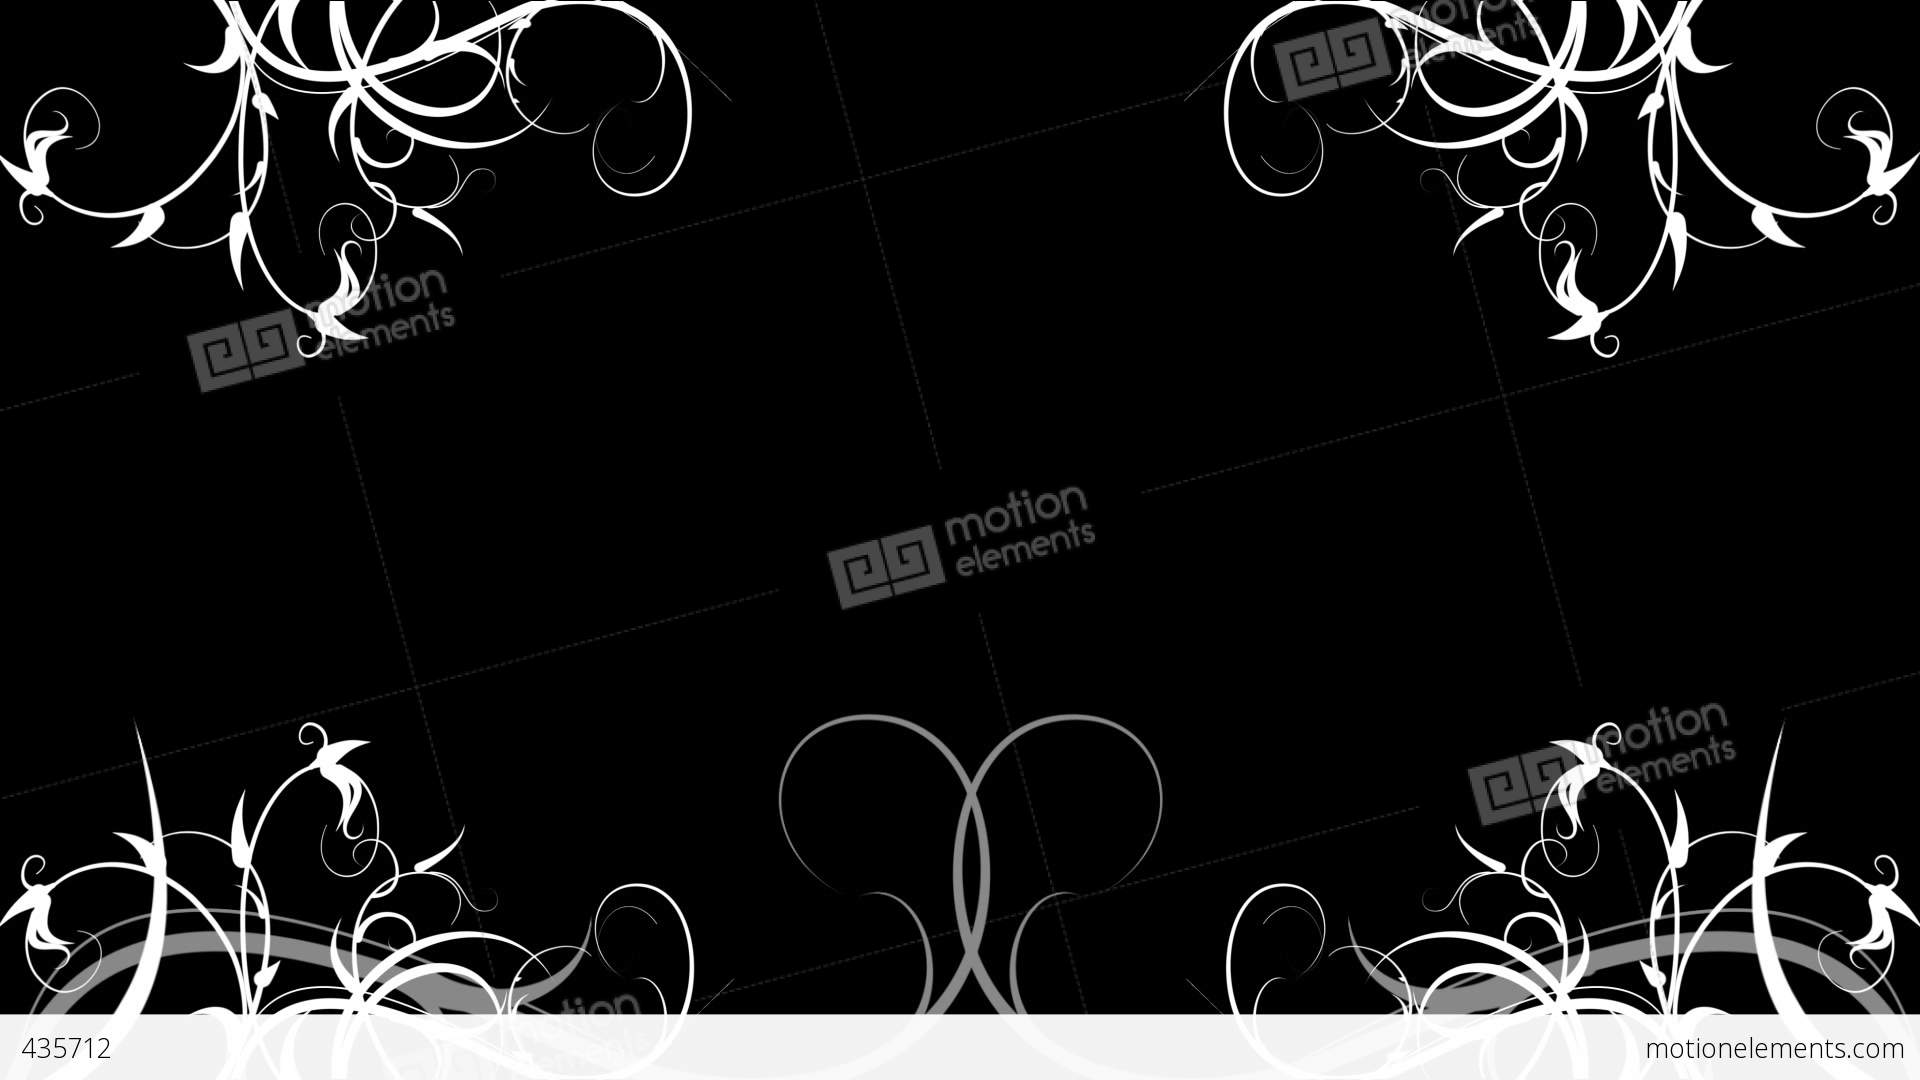 Deluxe Photo Editor App Download Black Photo Editor Ios Photo Editor Background Free Round Designs Photo Editor Background Free Round Designs Black photos Black And White Photo Editor